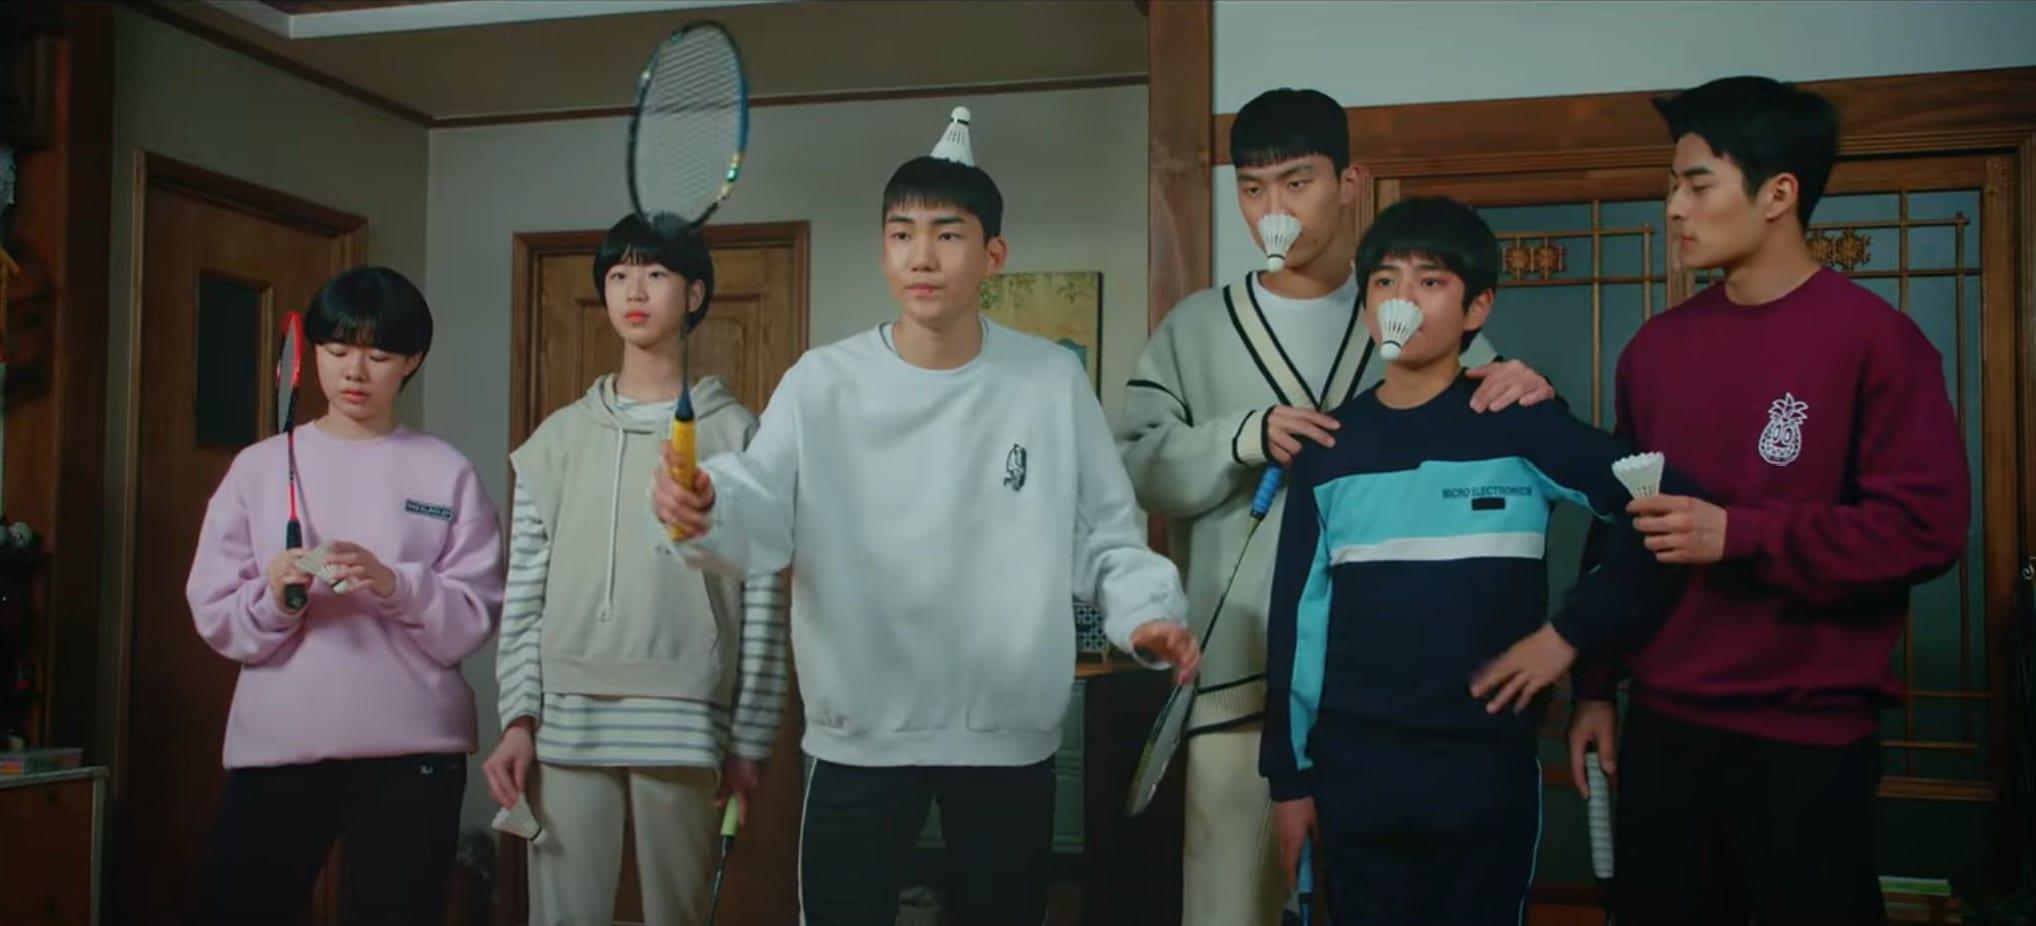 Racket Boys Episode 11 Release Date